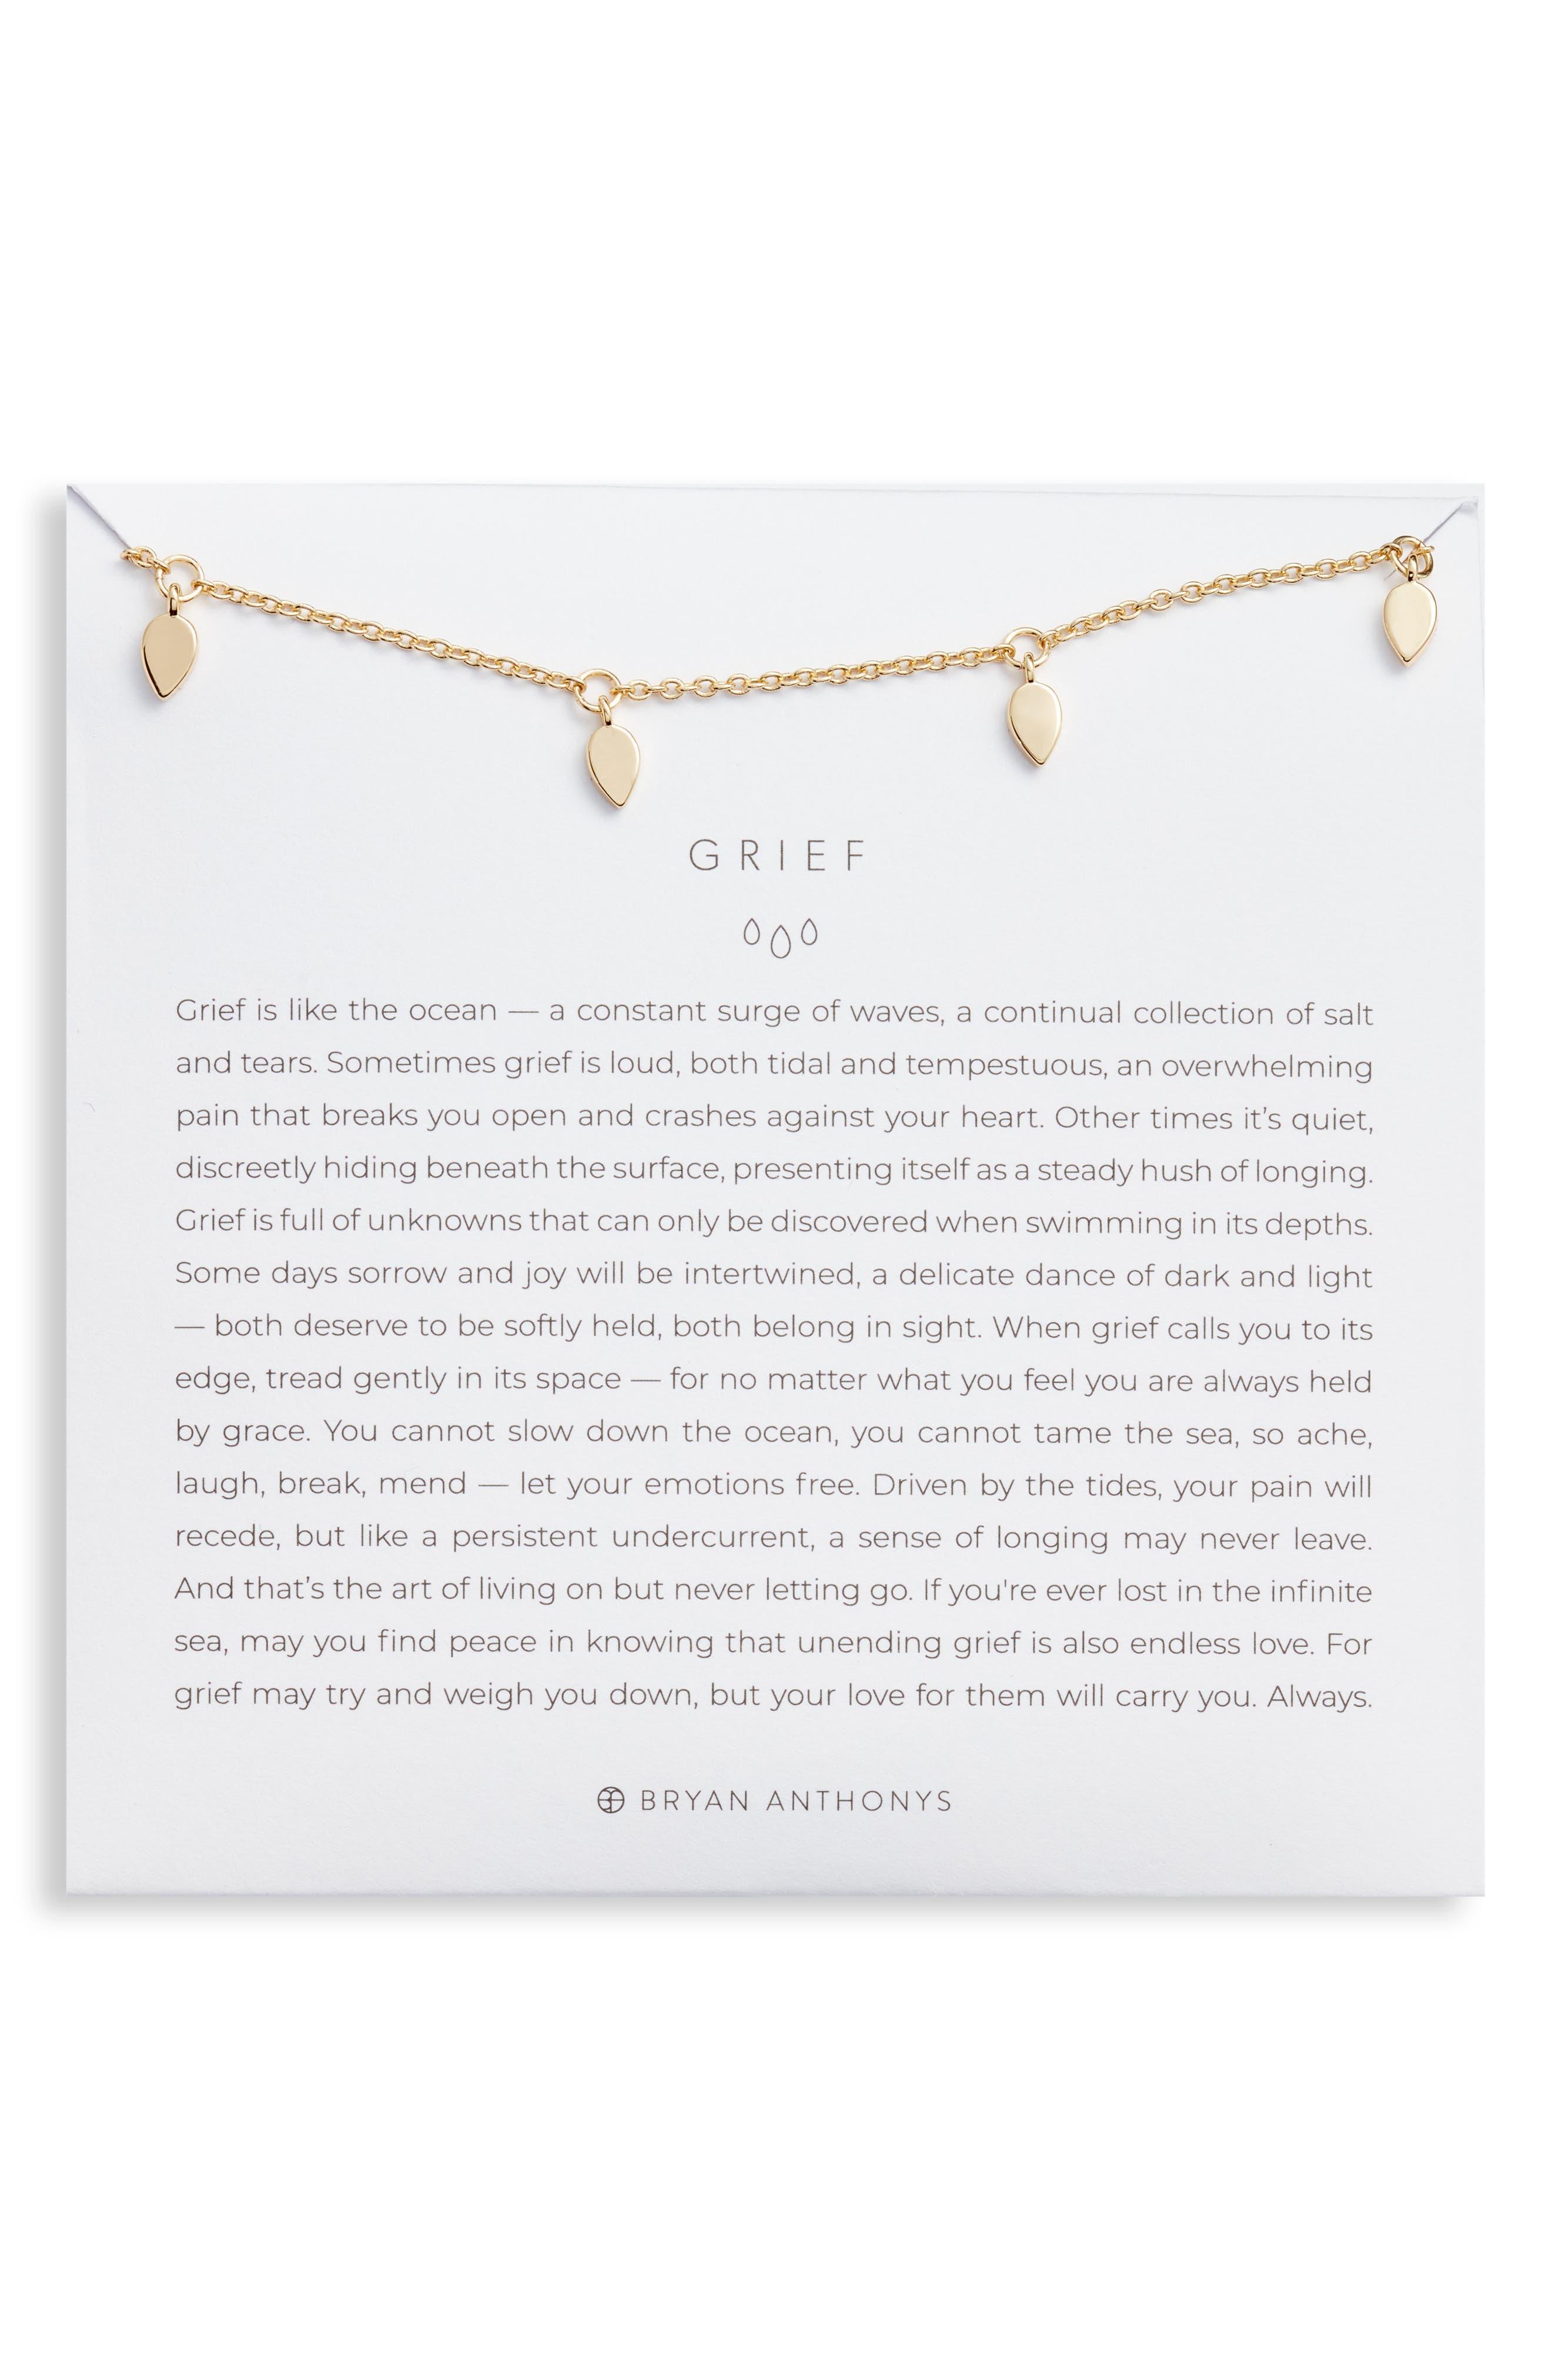 Grief Teardrop Necklace in 14K Gold at Nordstrom